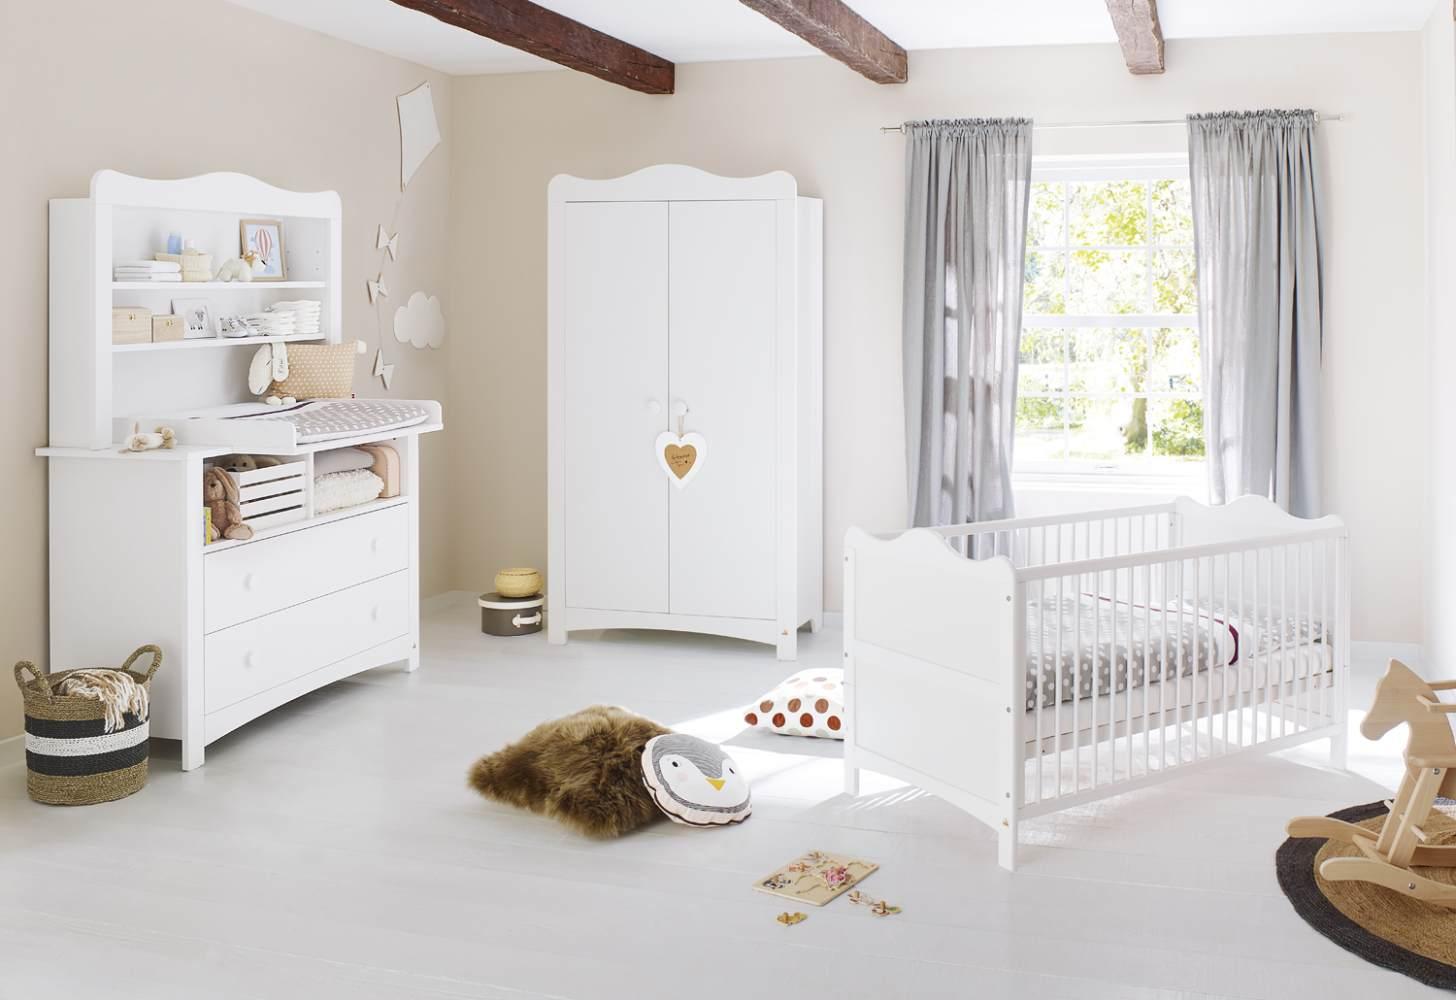 Pinolino 'Florentina' 3-tlg. Kinderzimmer-Set extrabreit, inkl. extrabreitem Regalaufsatz Bild 1